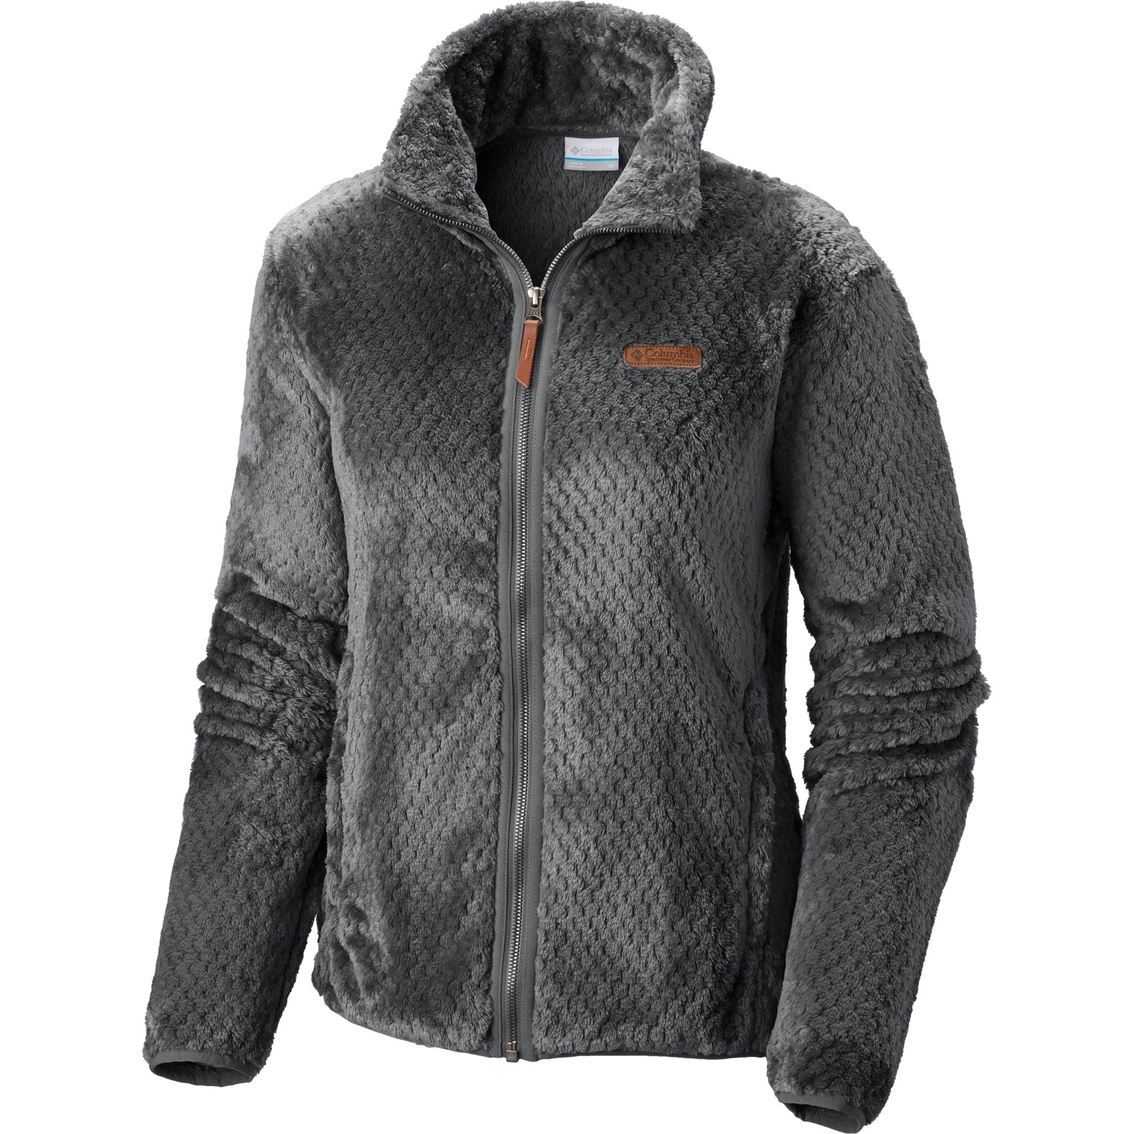 03a23a3b842 Columbia Fire Side Ii Sherpa Full Zip Jacket